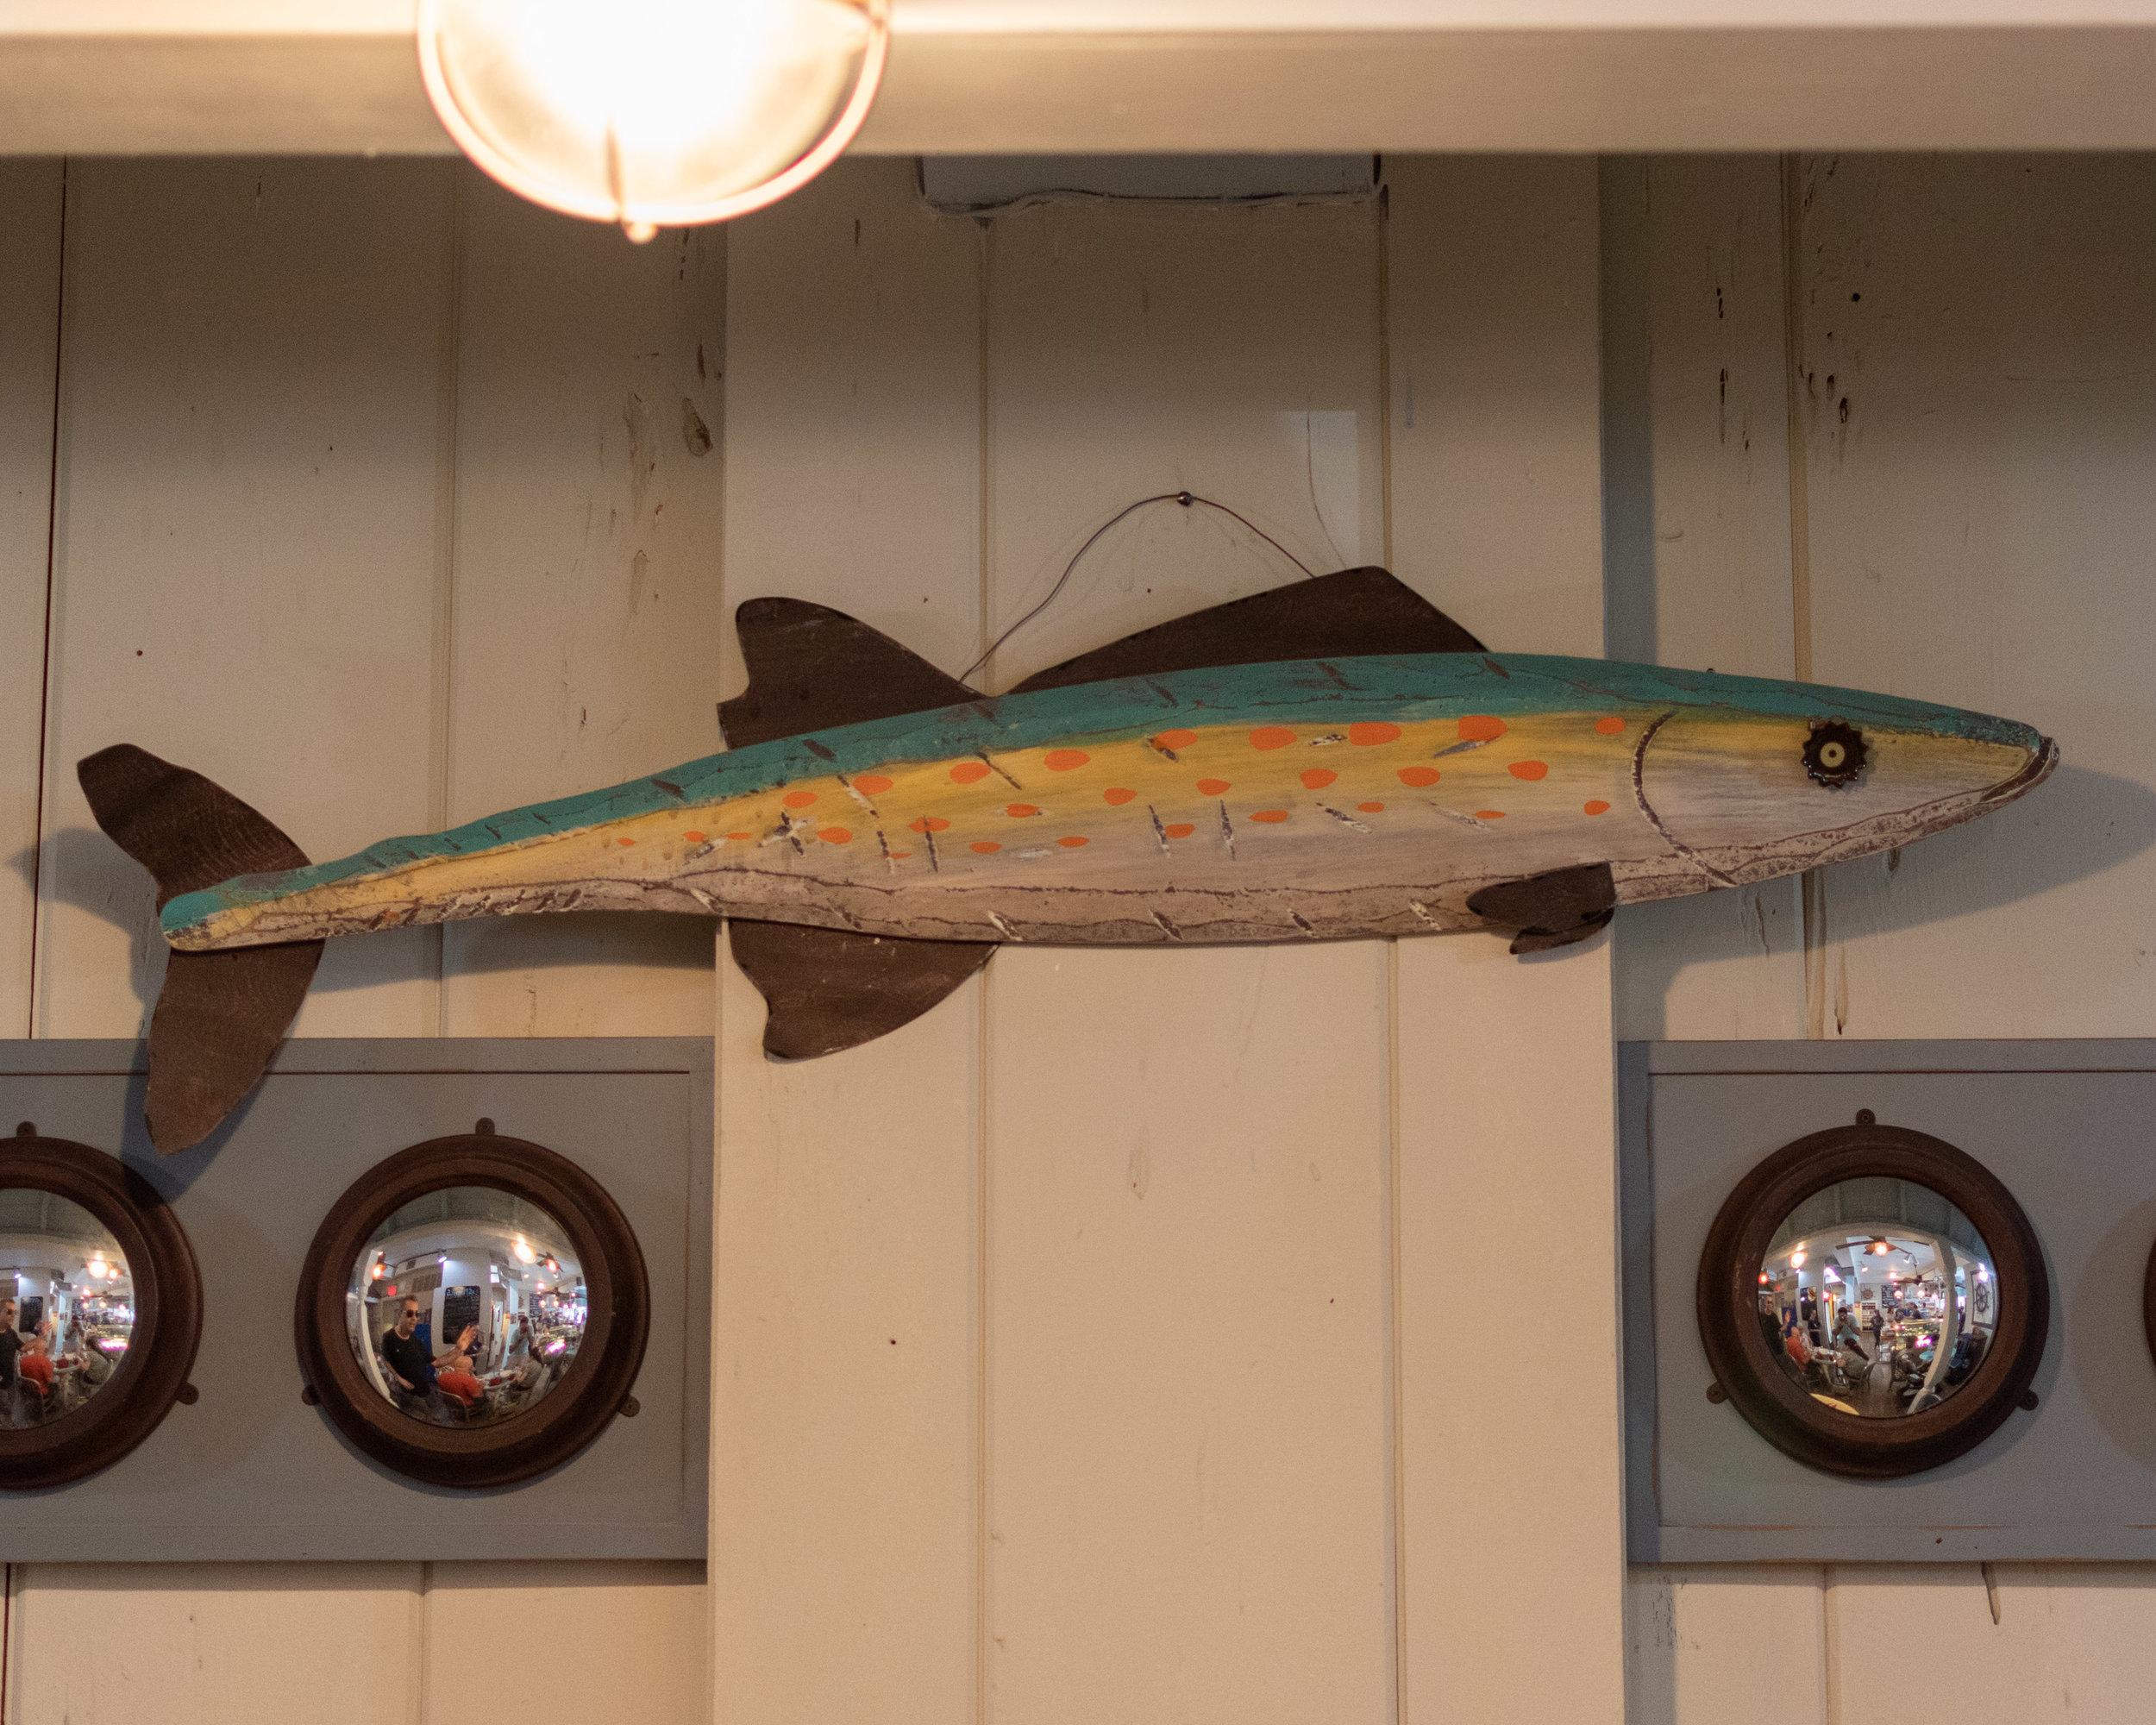 Gourmet_Whaler_Fish_Tacos_fish.jpg